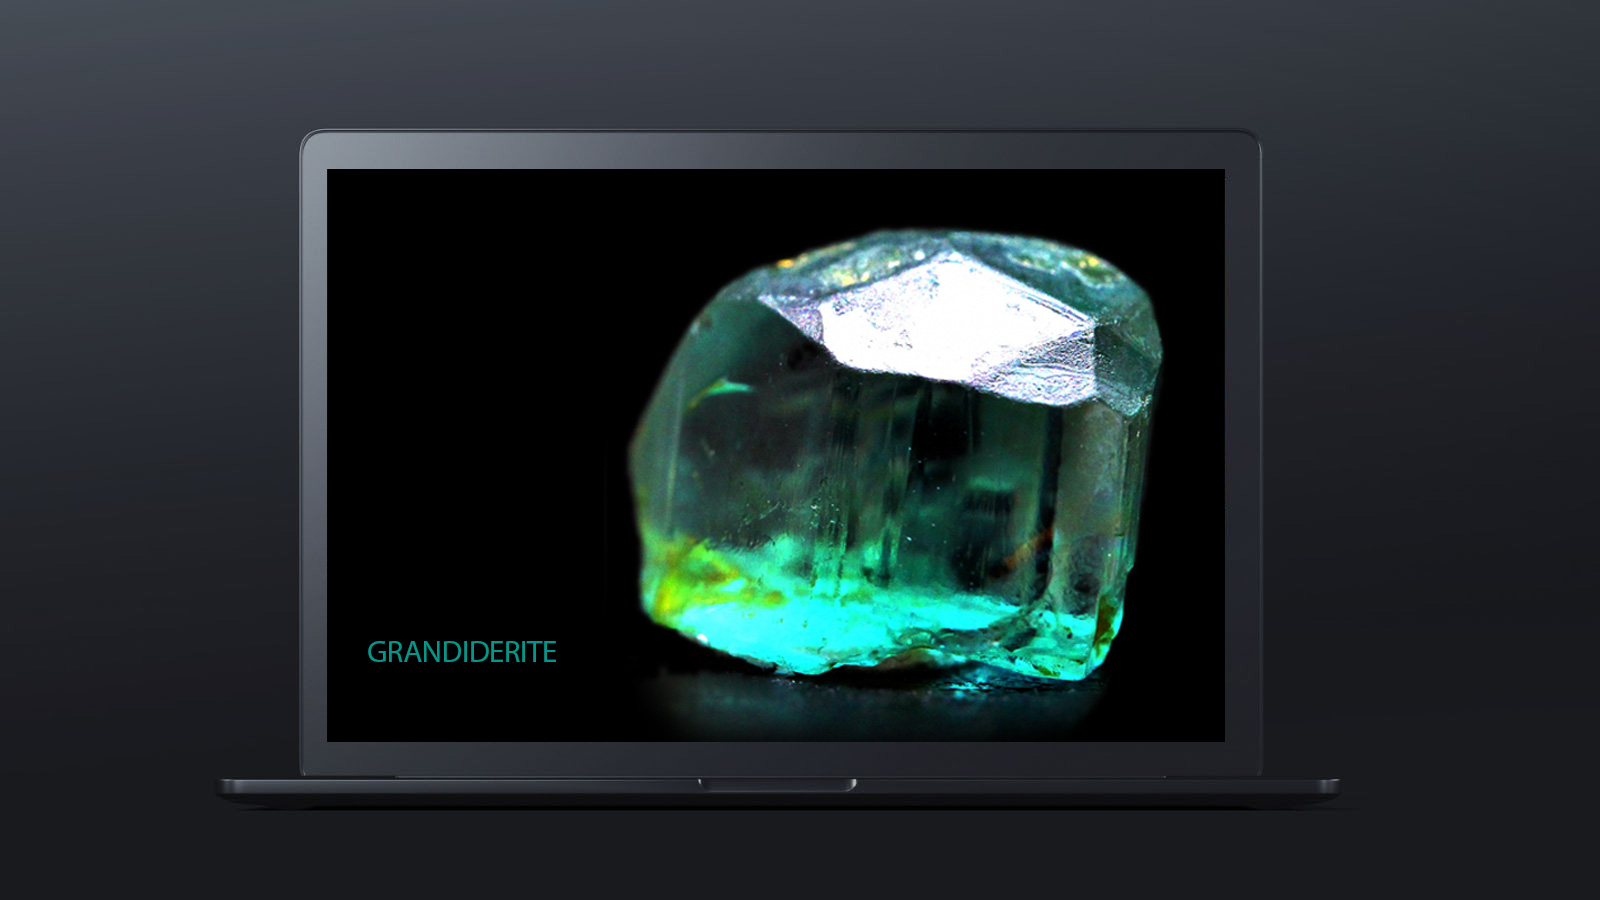 10 worlds rarest gemstones GRANDIDERITE 1 - ده گوهر کمیاب دنیا کدامند؟